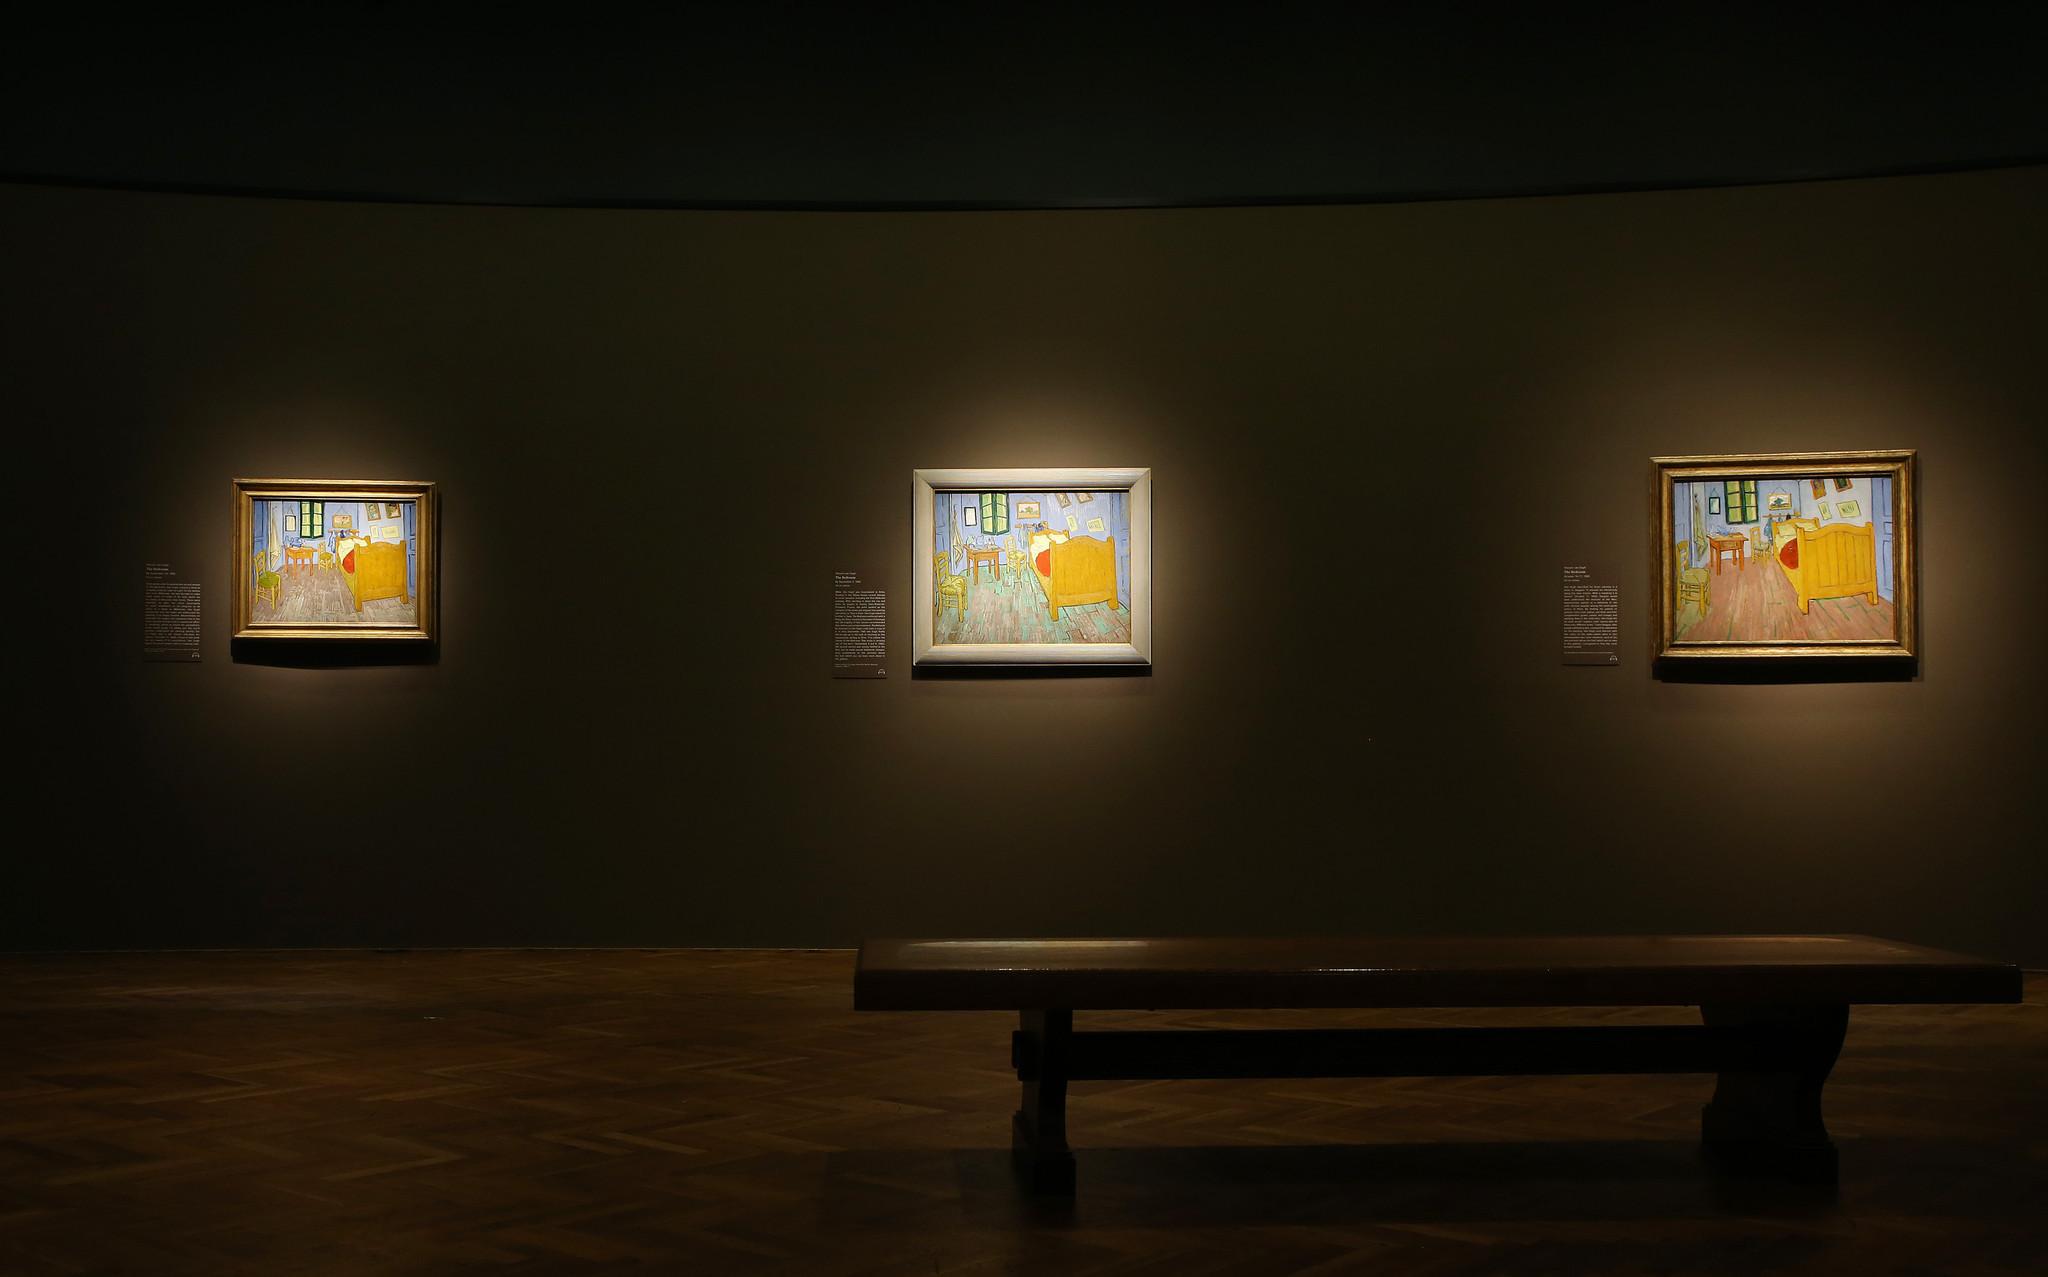 van gogh's bedrooms' at art institute show artist's quest for home